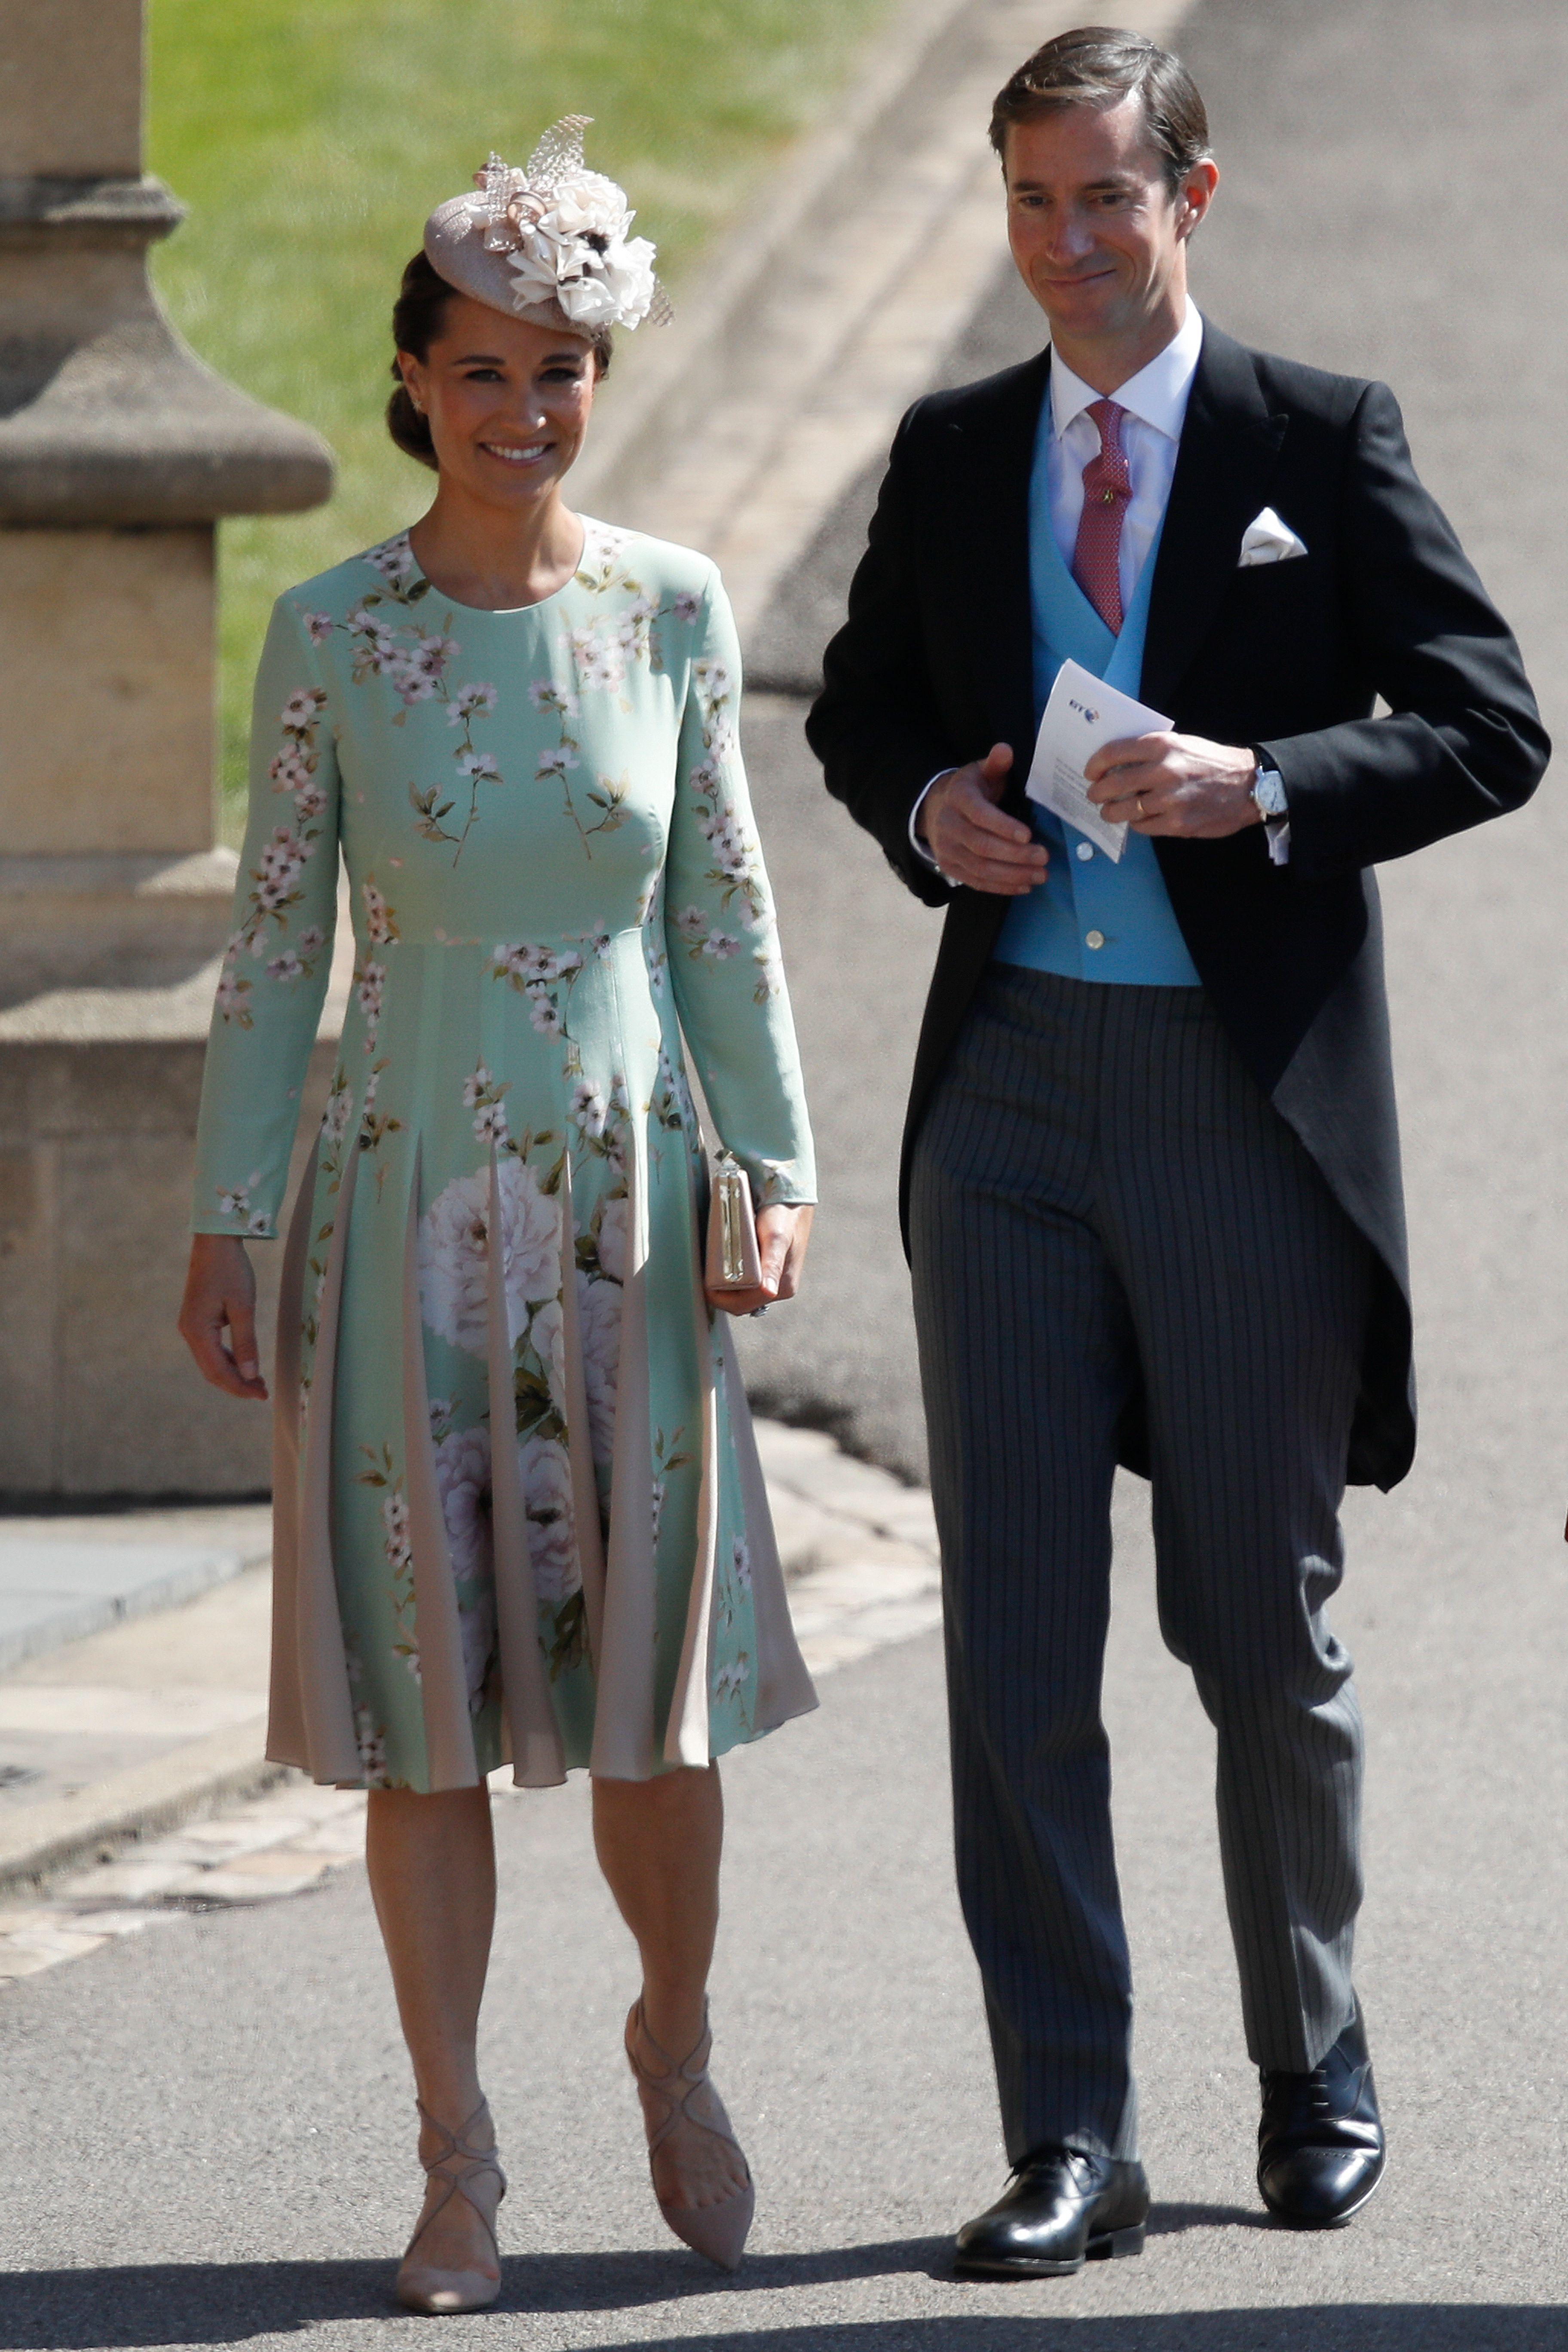 https://hips.hearstapps.com/hmg-prod.s3.amazonaws.com/images/pippa-middleton-royal-wedding-2018-1526723275.jpg